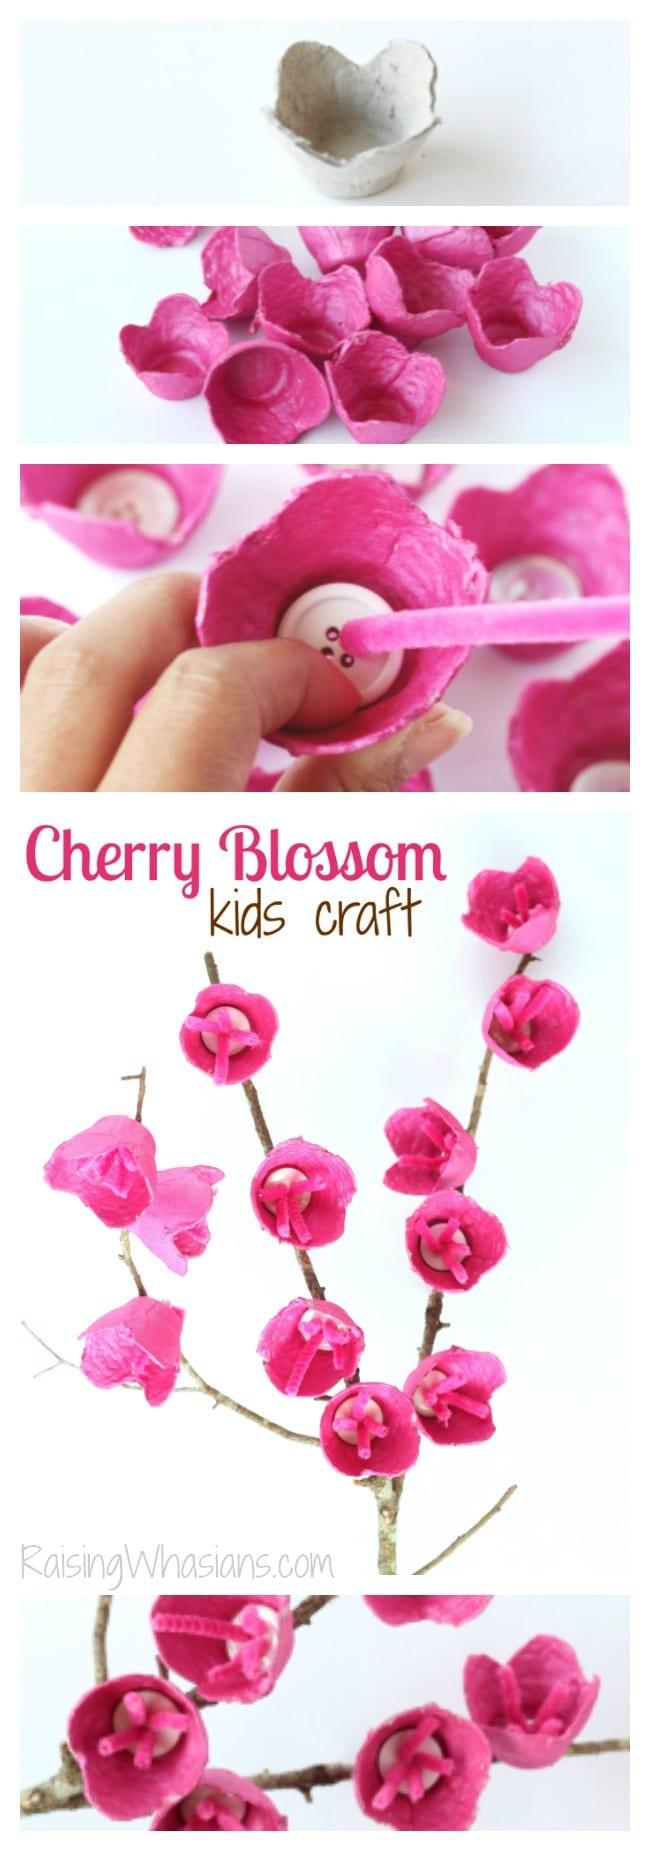 Cherry blossom craft pinterest